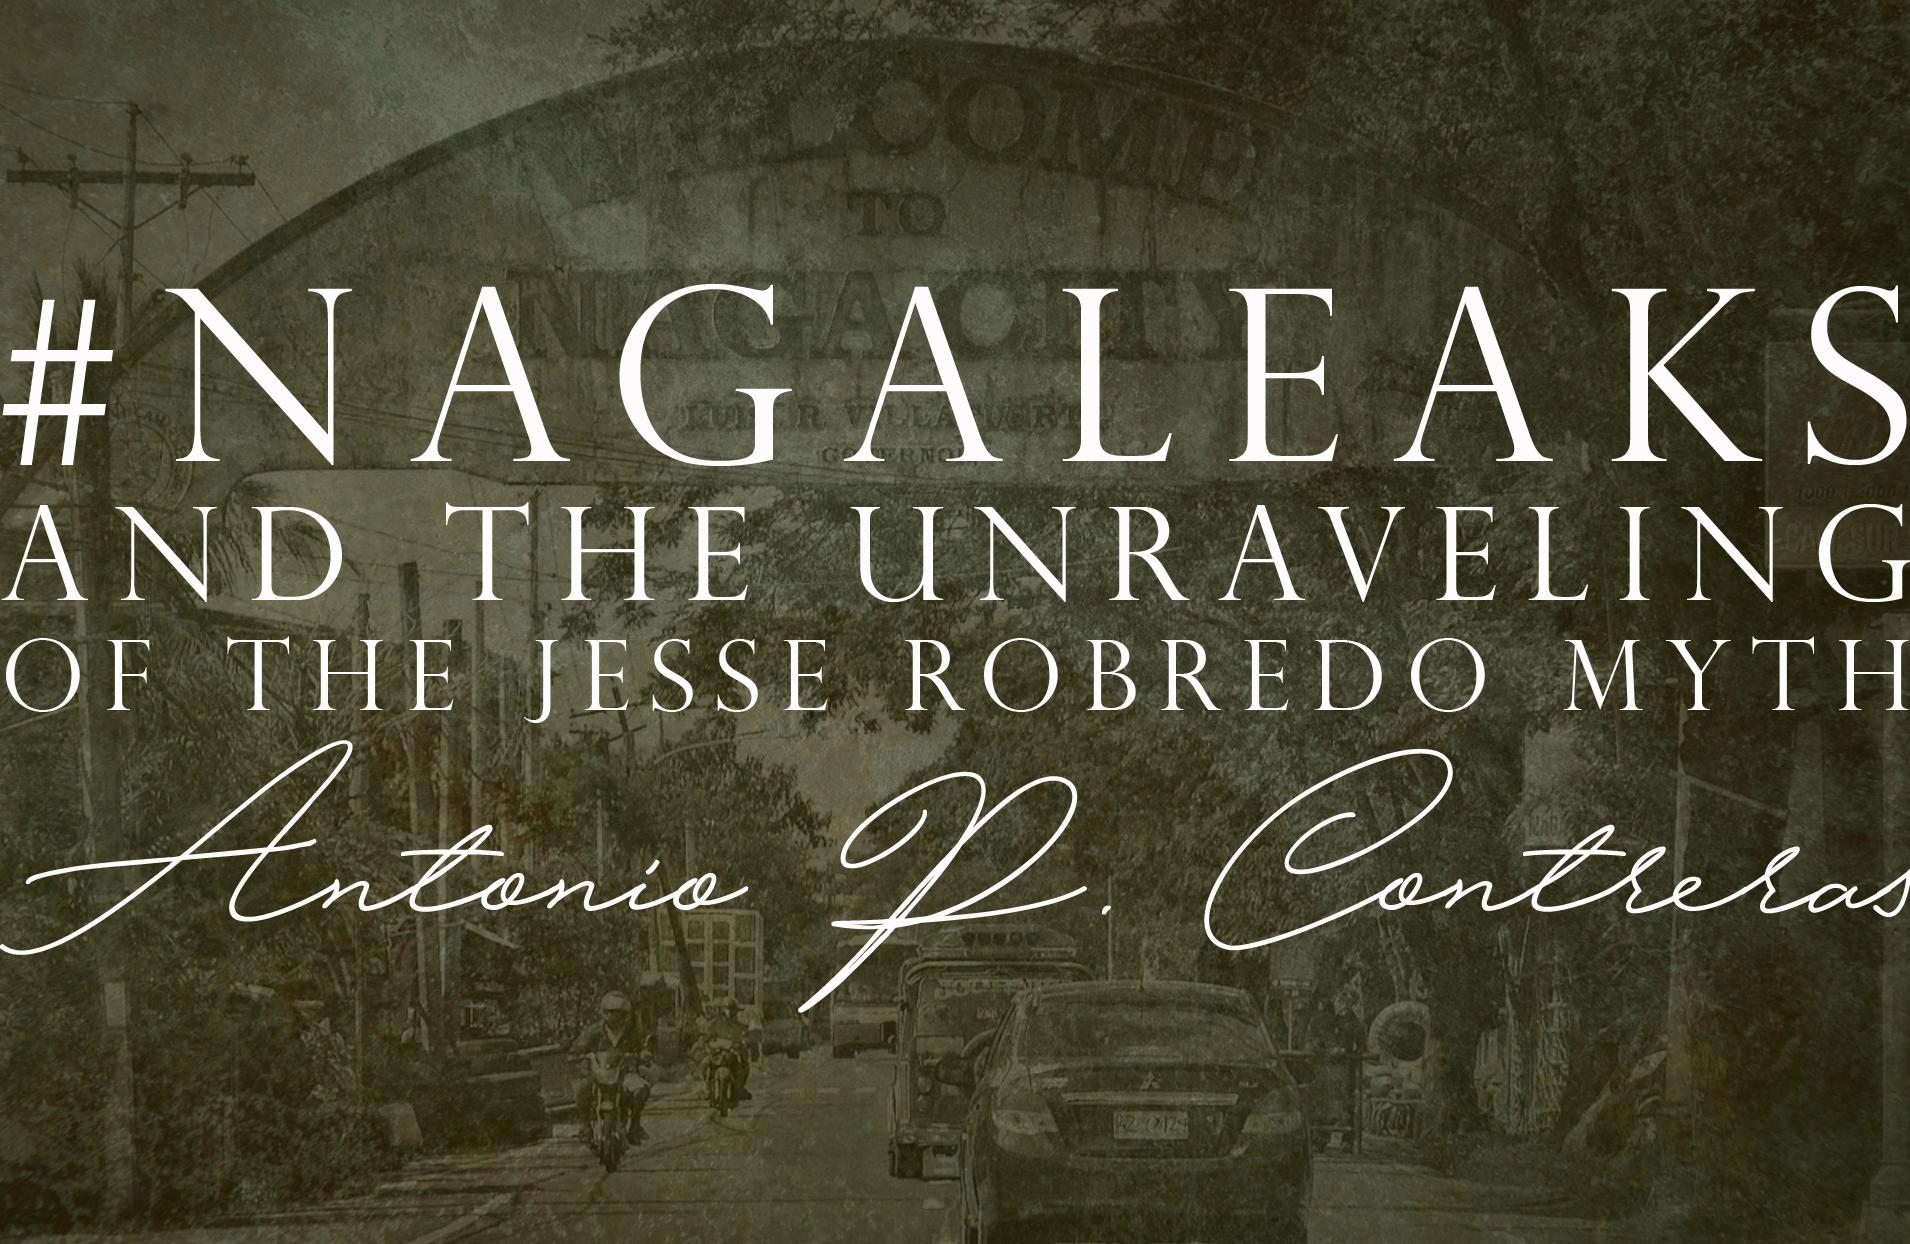 #nagaleaks And The Unraveling Of The Robredo Myth